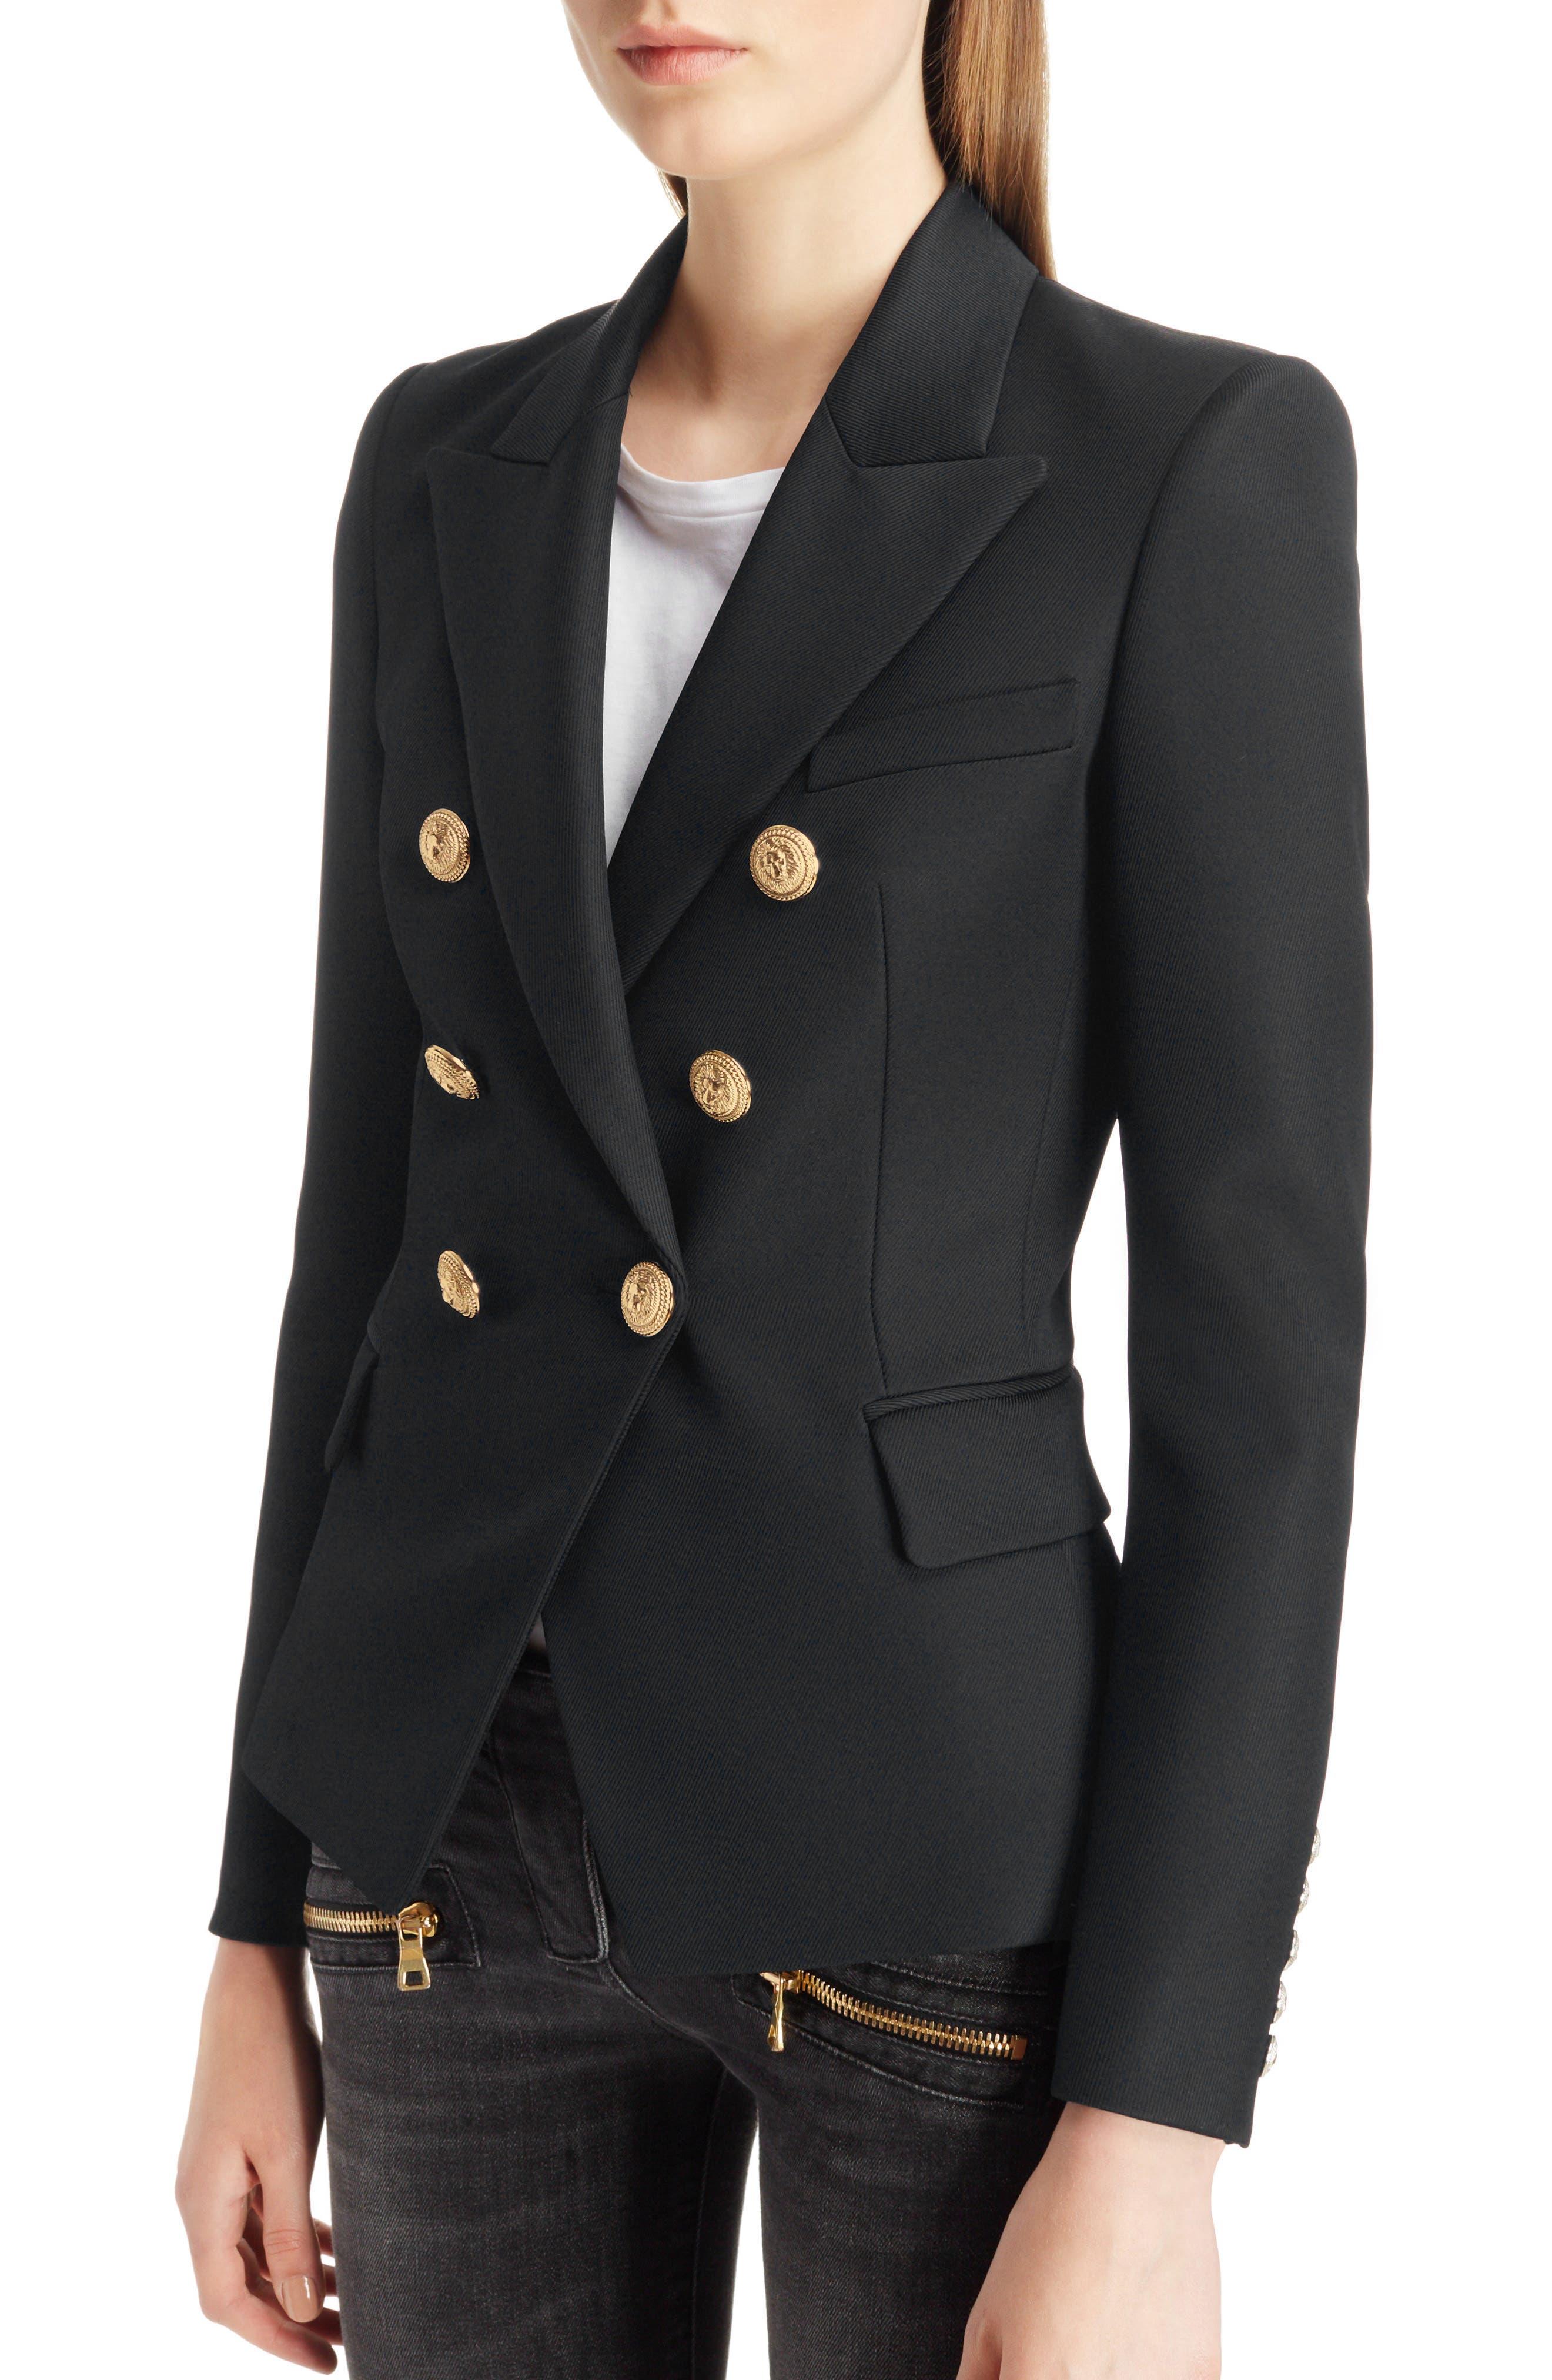 BALMAIN, Double Breasted Wool Blazer, Alternate thumbnail 4, color, BLACK/GOLD